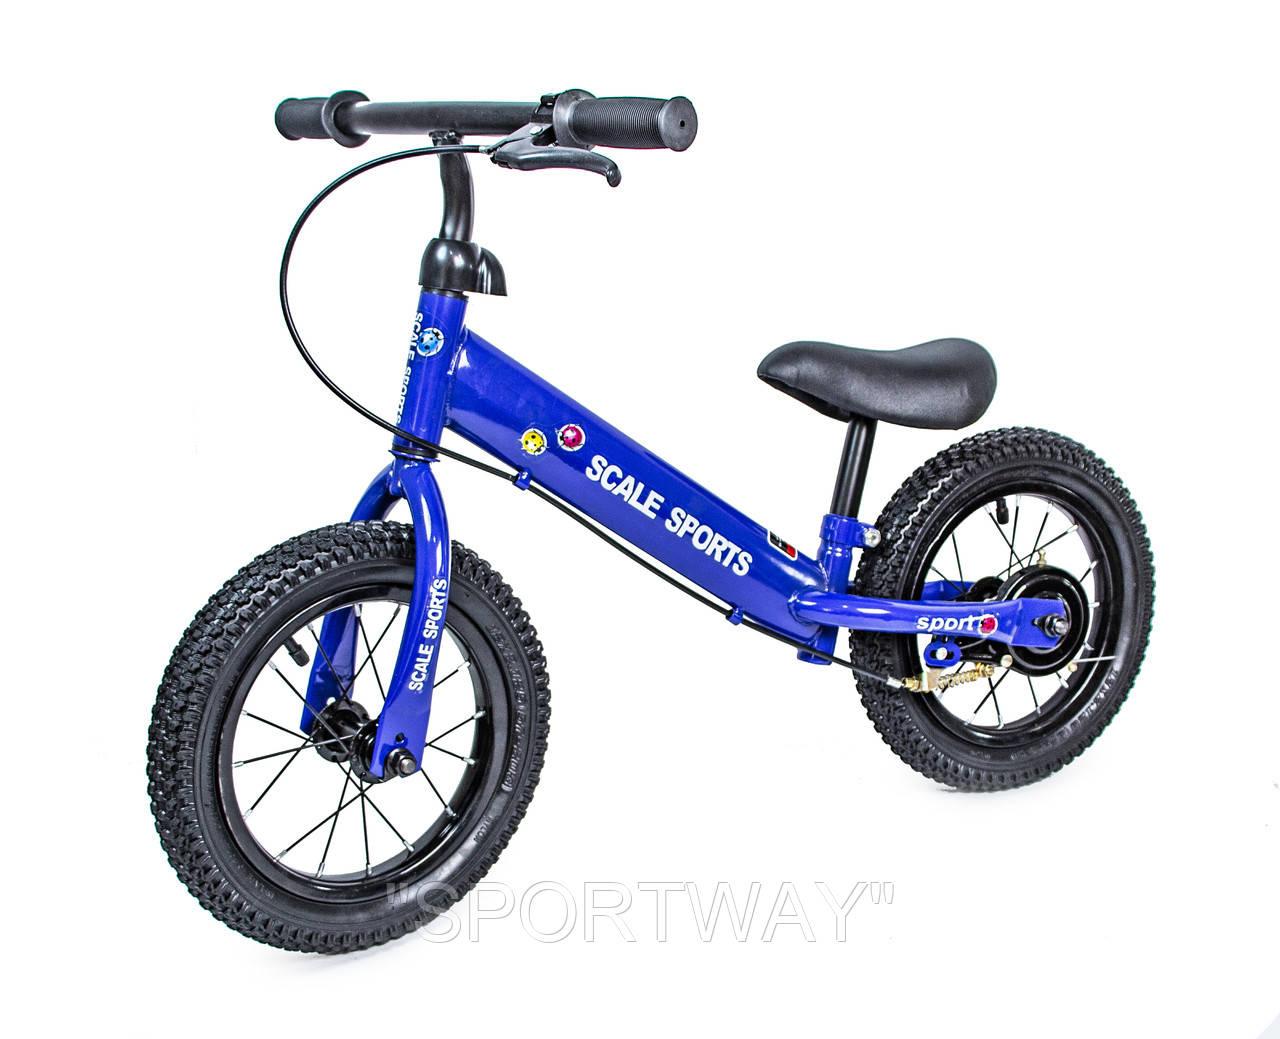 Велобег Scale Sports. Синий цвет. Дисковый тормоз!